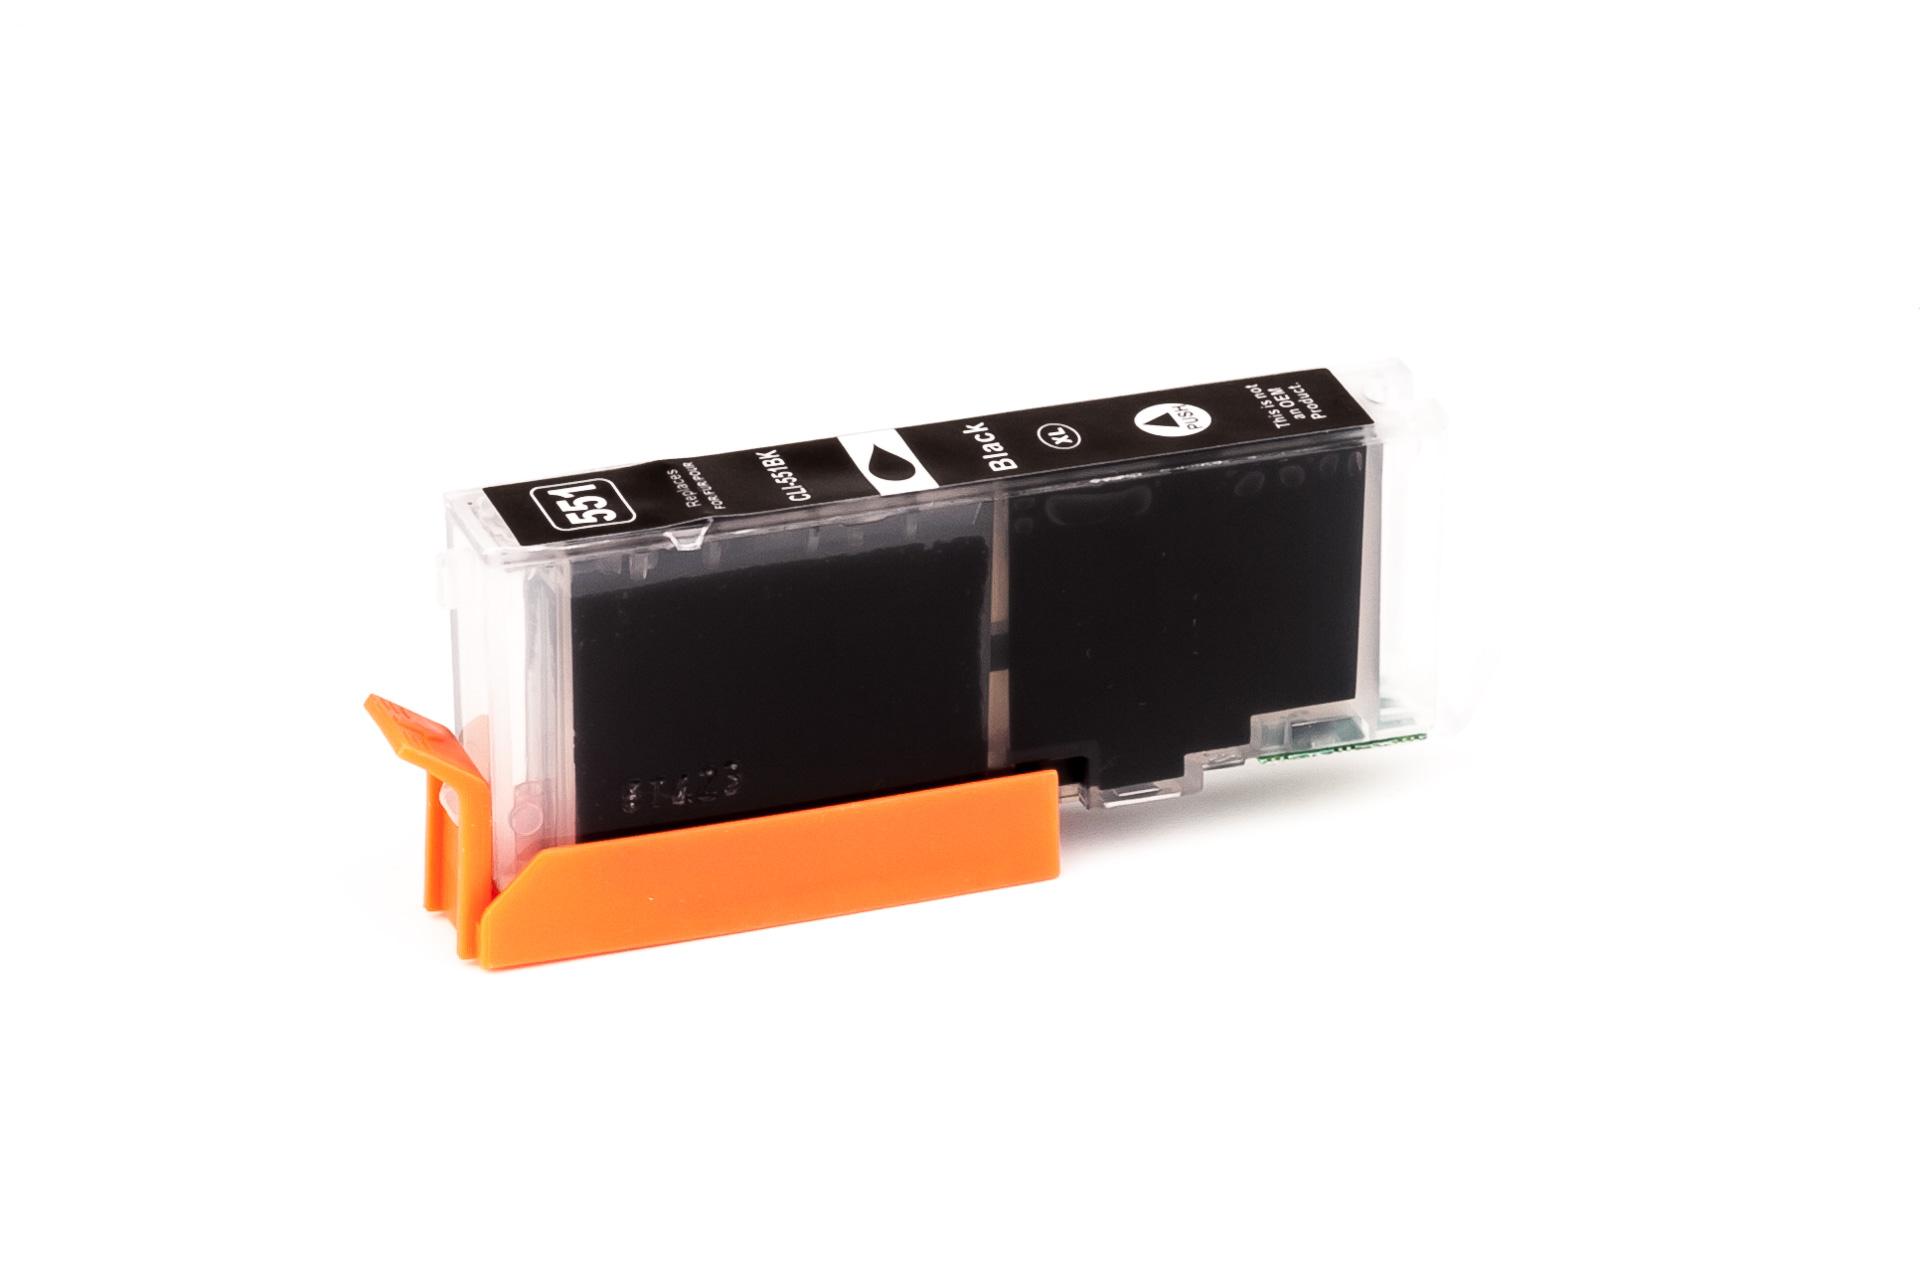 ASC-Premium-Tintenpatrone für Canon Pixma MG 5550 schwarz Pixma MG 5550 PixmaMG5550